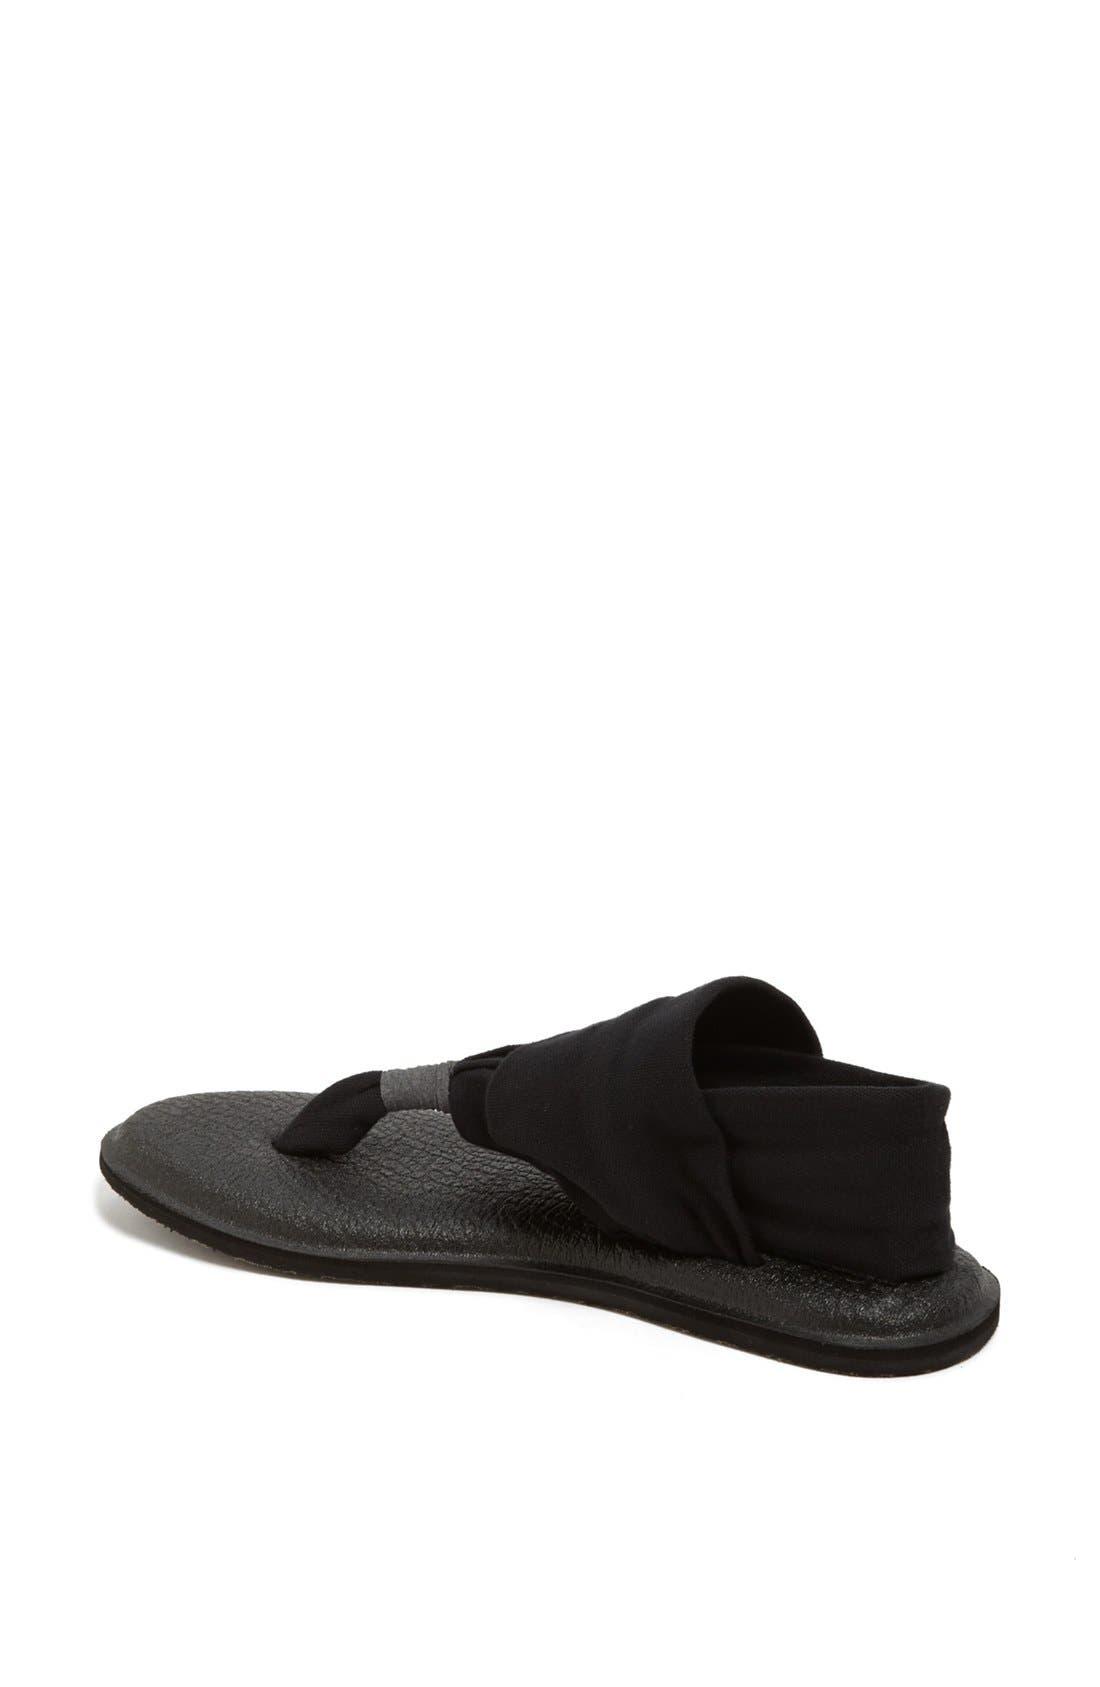 'Yoga Sling 2' Sandal,                             Alternate thumbnail 3, color,                             BLACK